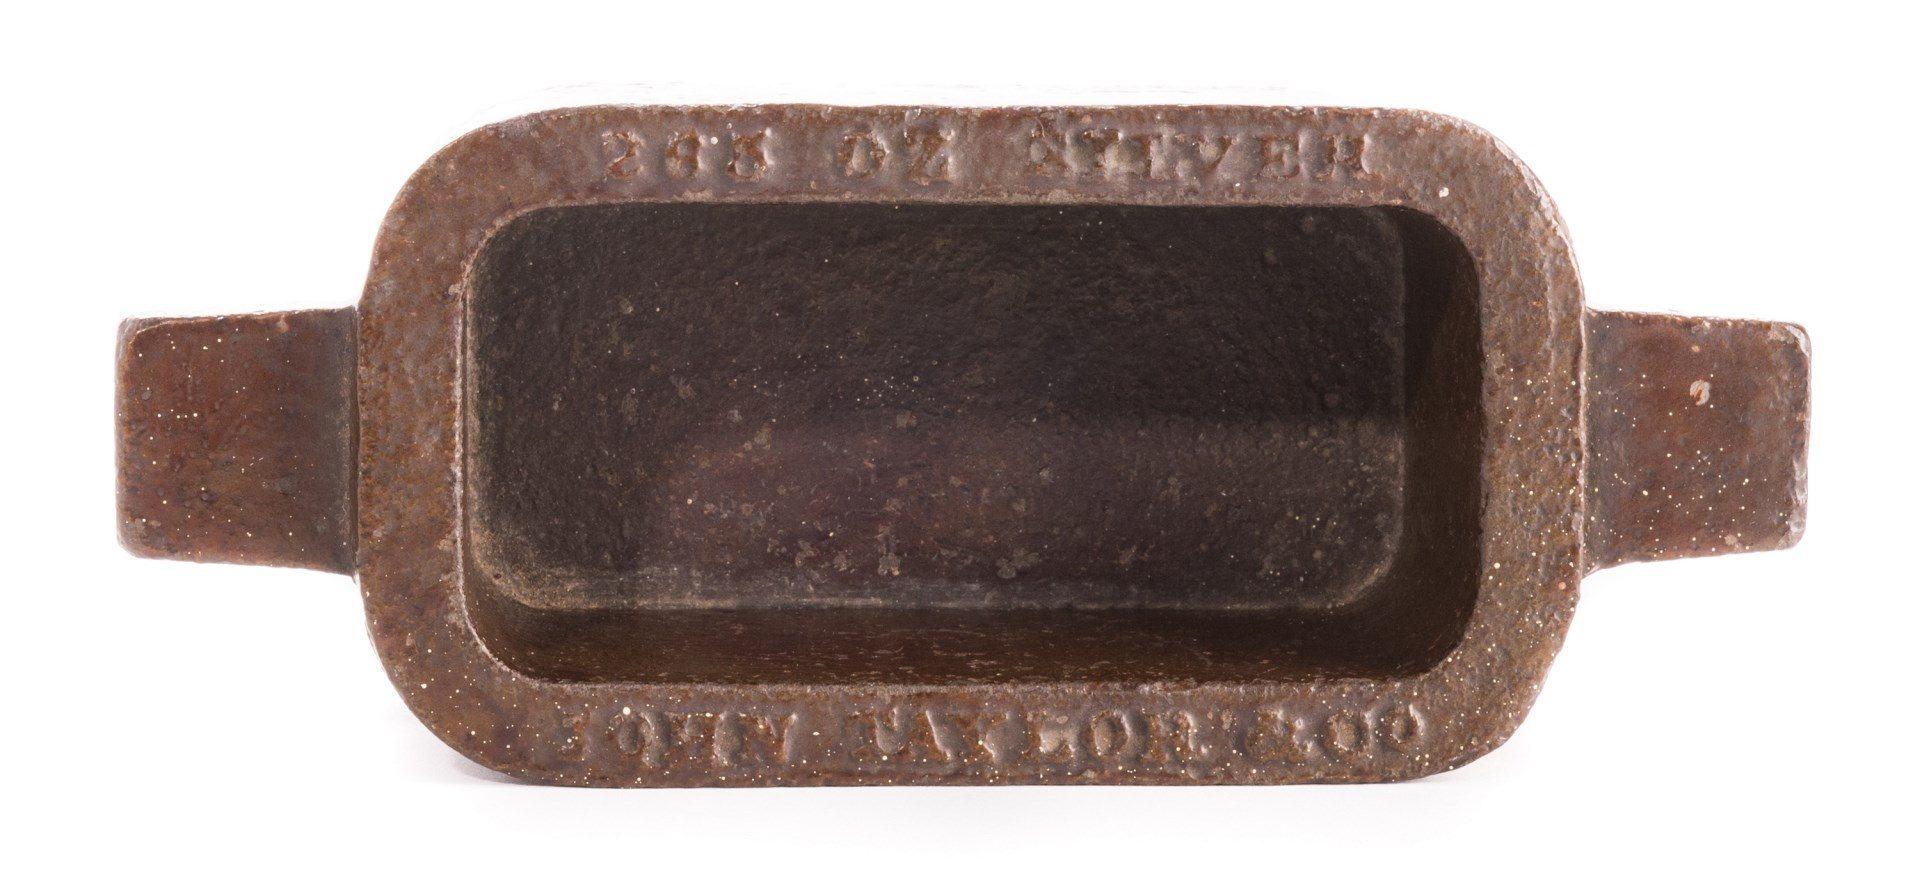 Lot 236: John Taylor & Co. Silver Ingot Mold